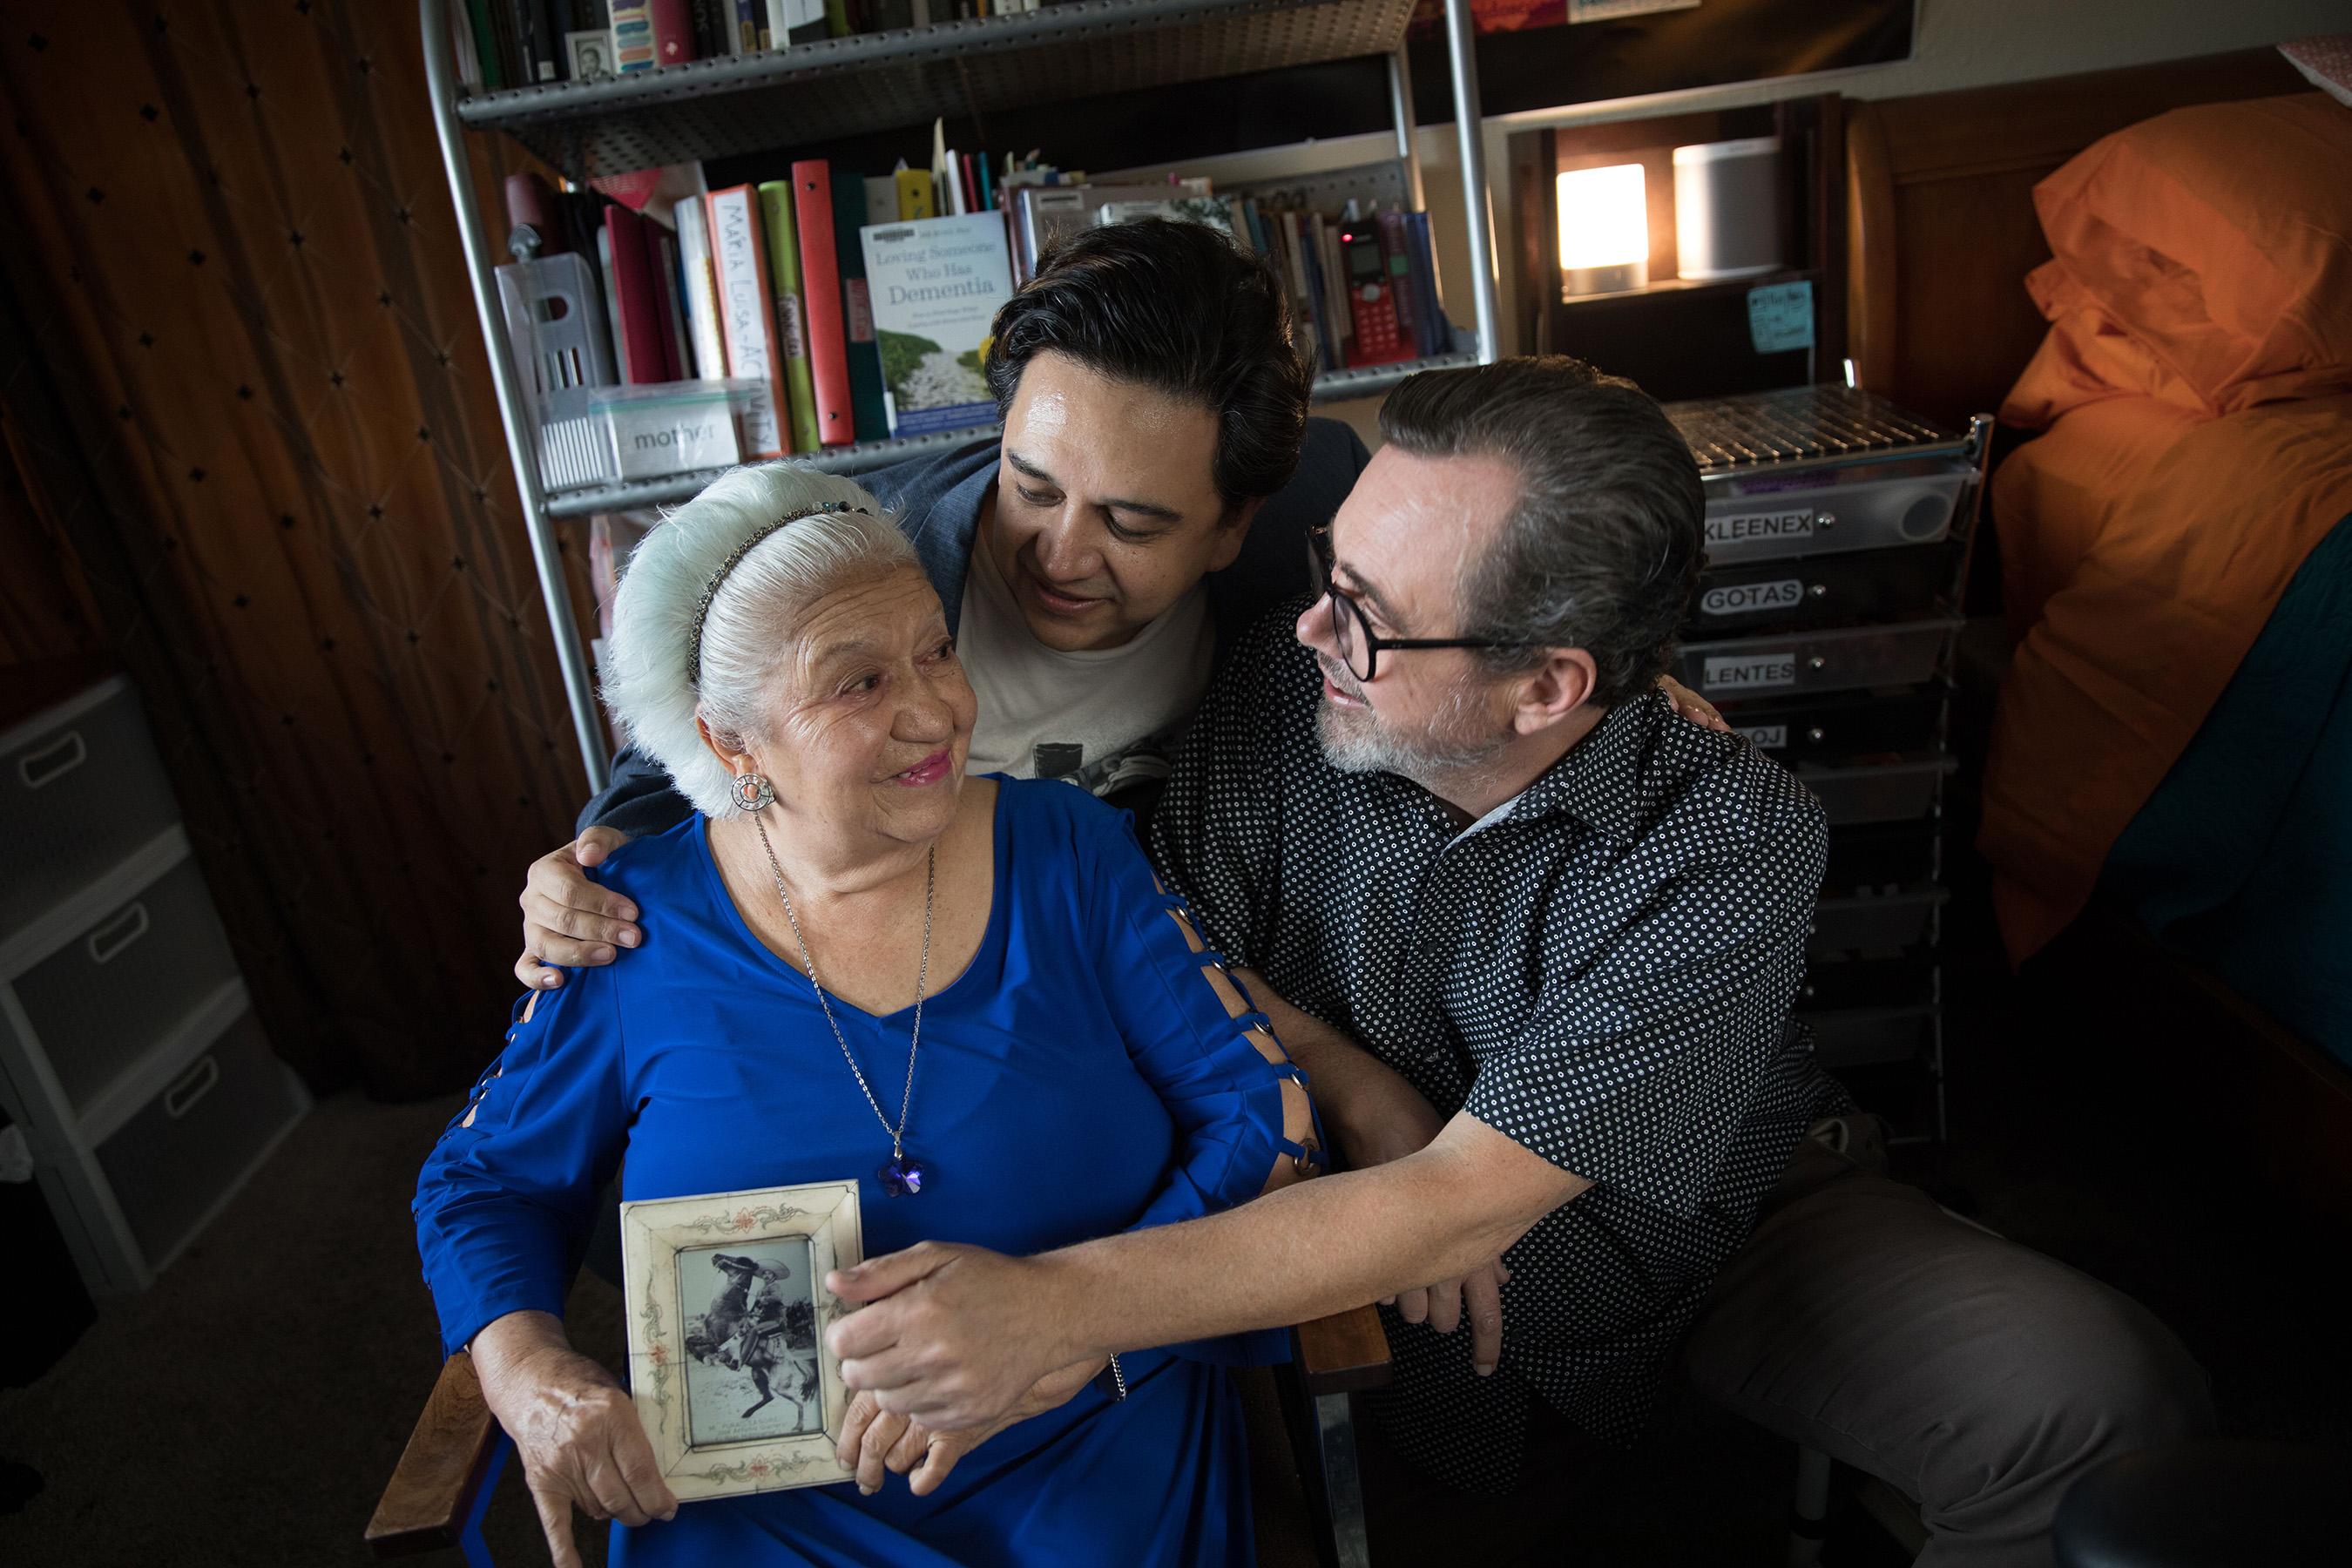 Tech Guerrero, his husband Michael Street and Guerrero's mother, Maria Luisa Castillo Rocha.